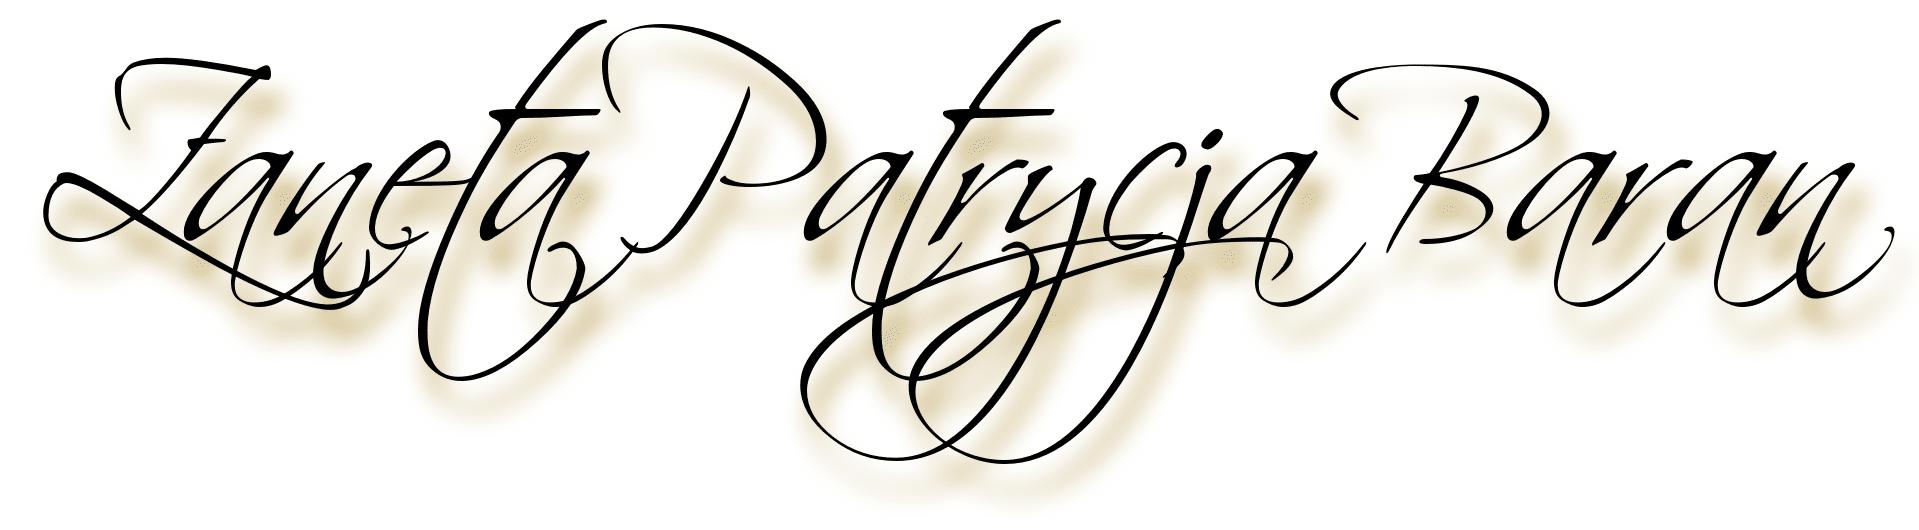 Zaneta Patrycja Baran